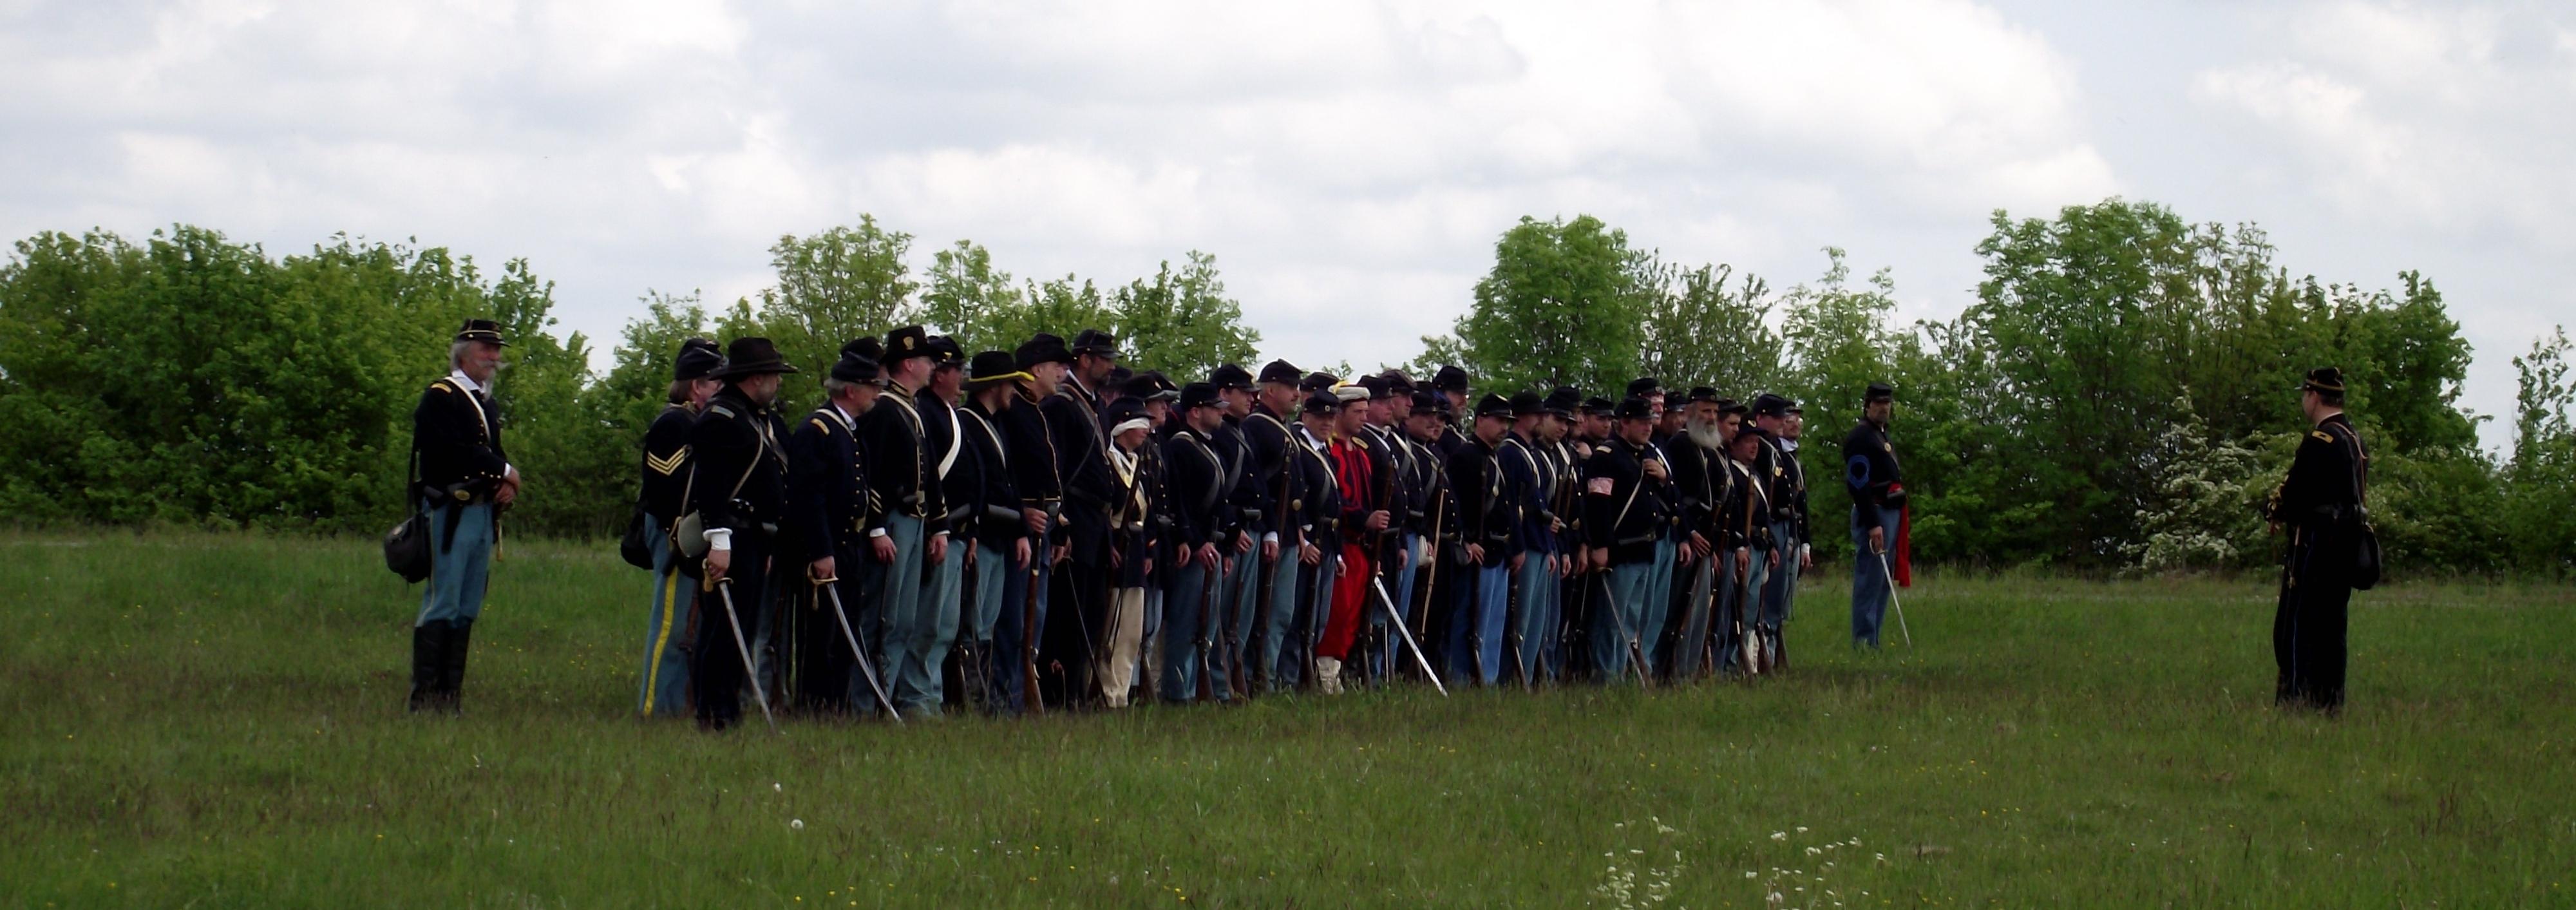 A Field Trip Back in Time: American Civil War Reenactment in